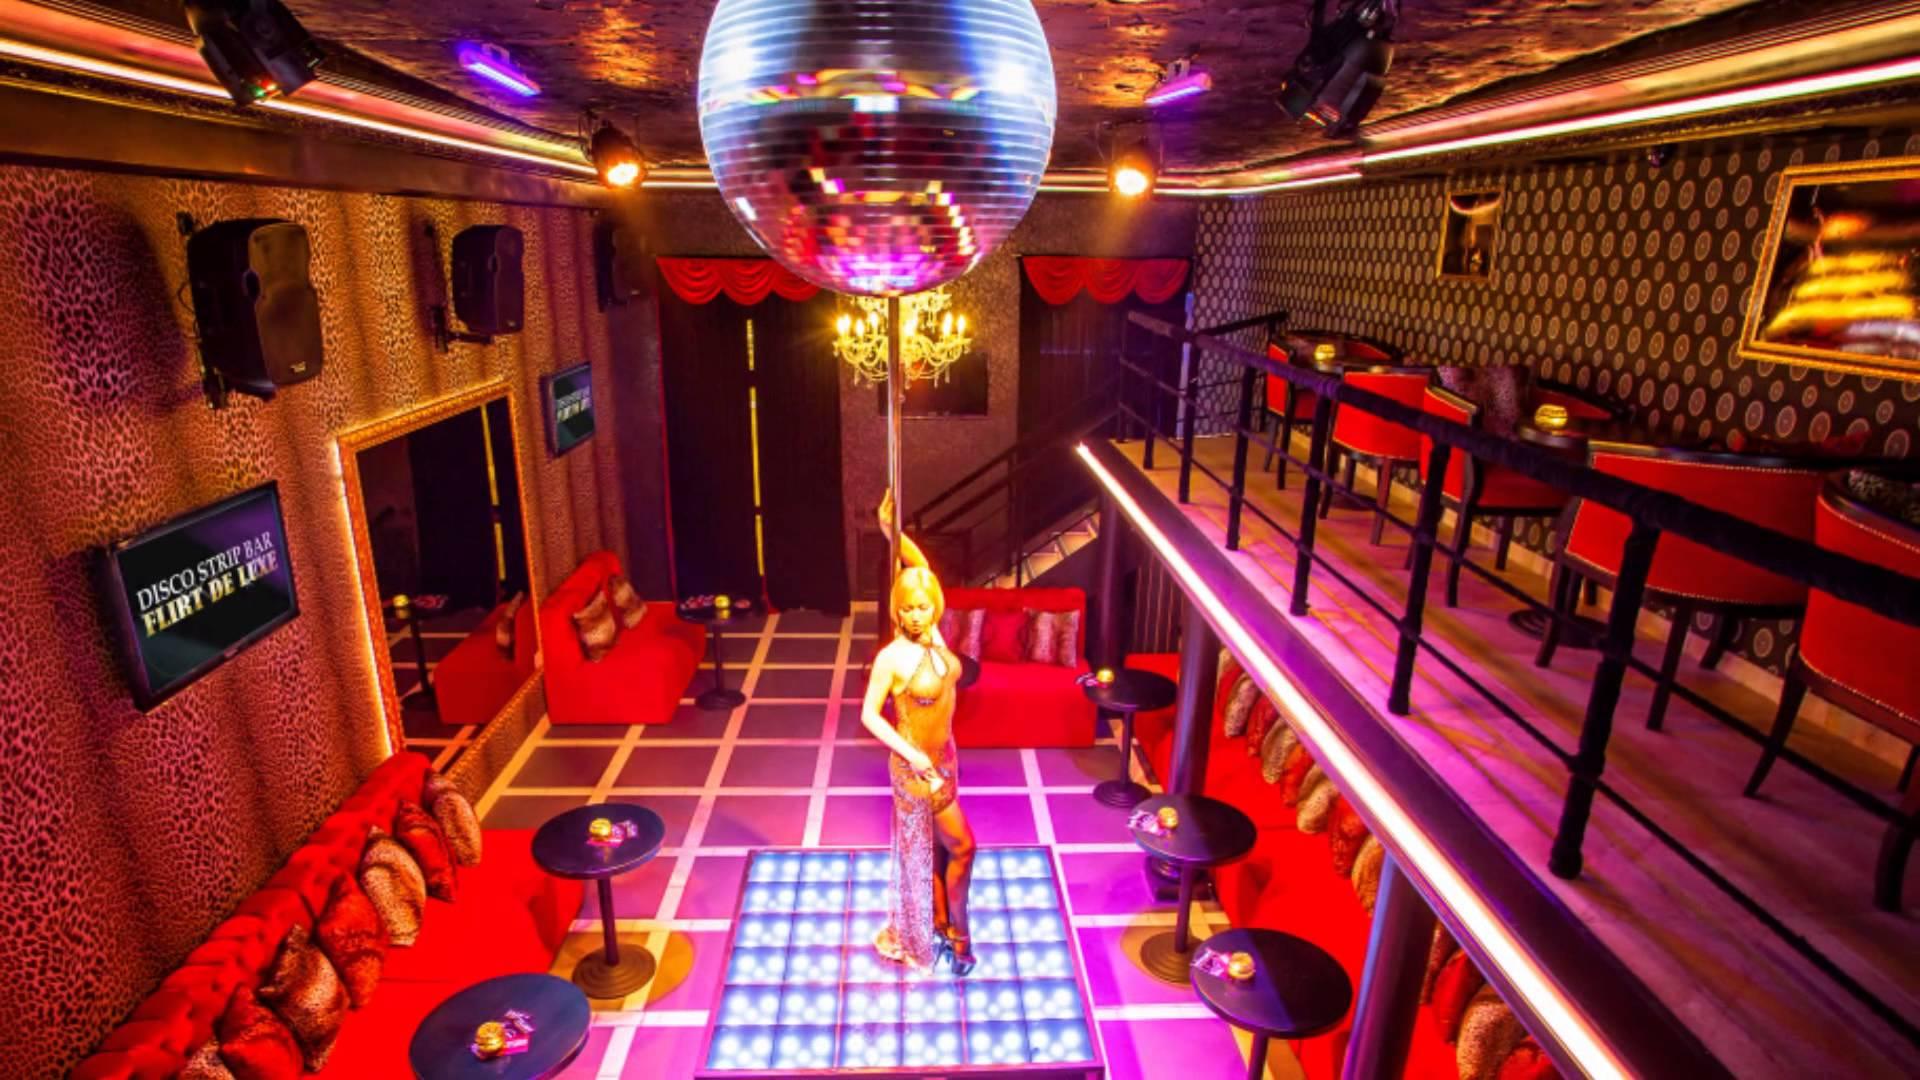 Стриптиз бар фото 10 фотография